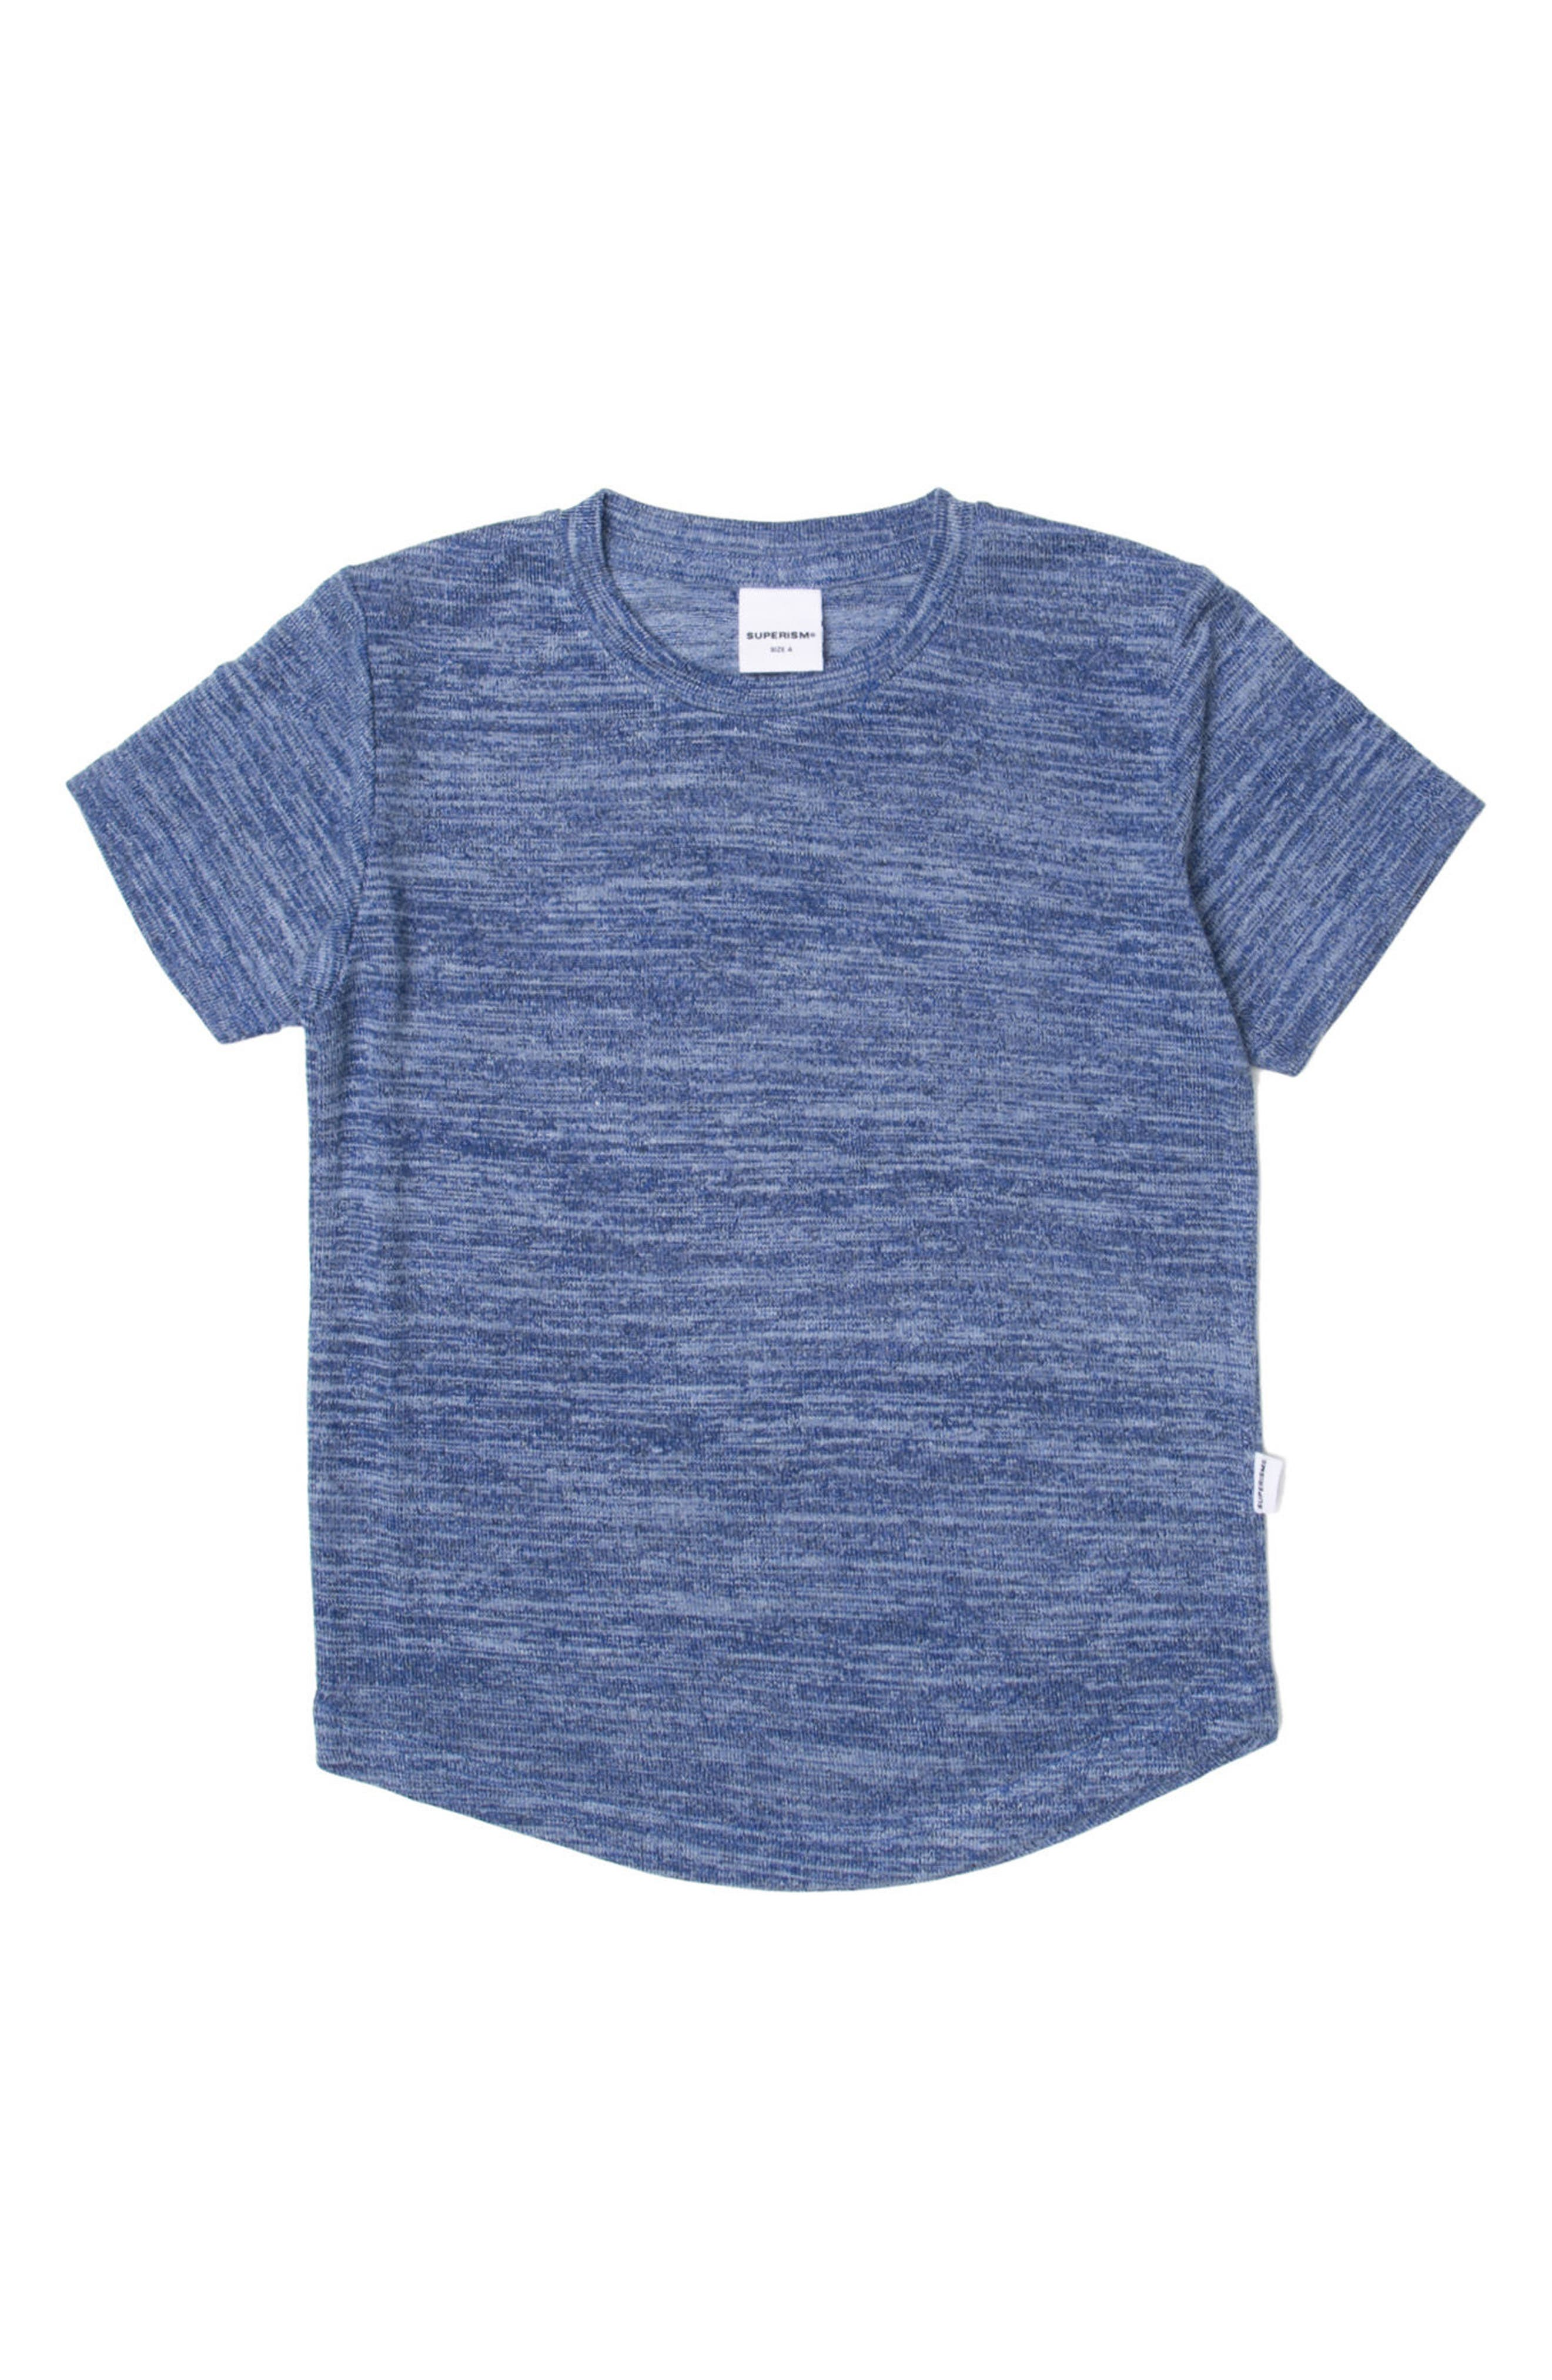 Landon T-Shirt,                             Main thumbnail 1, color,                             Blue